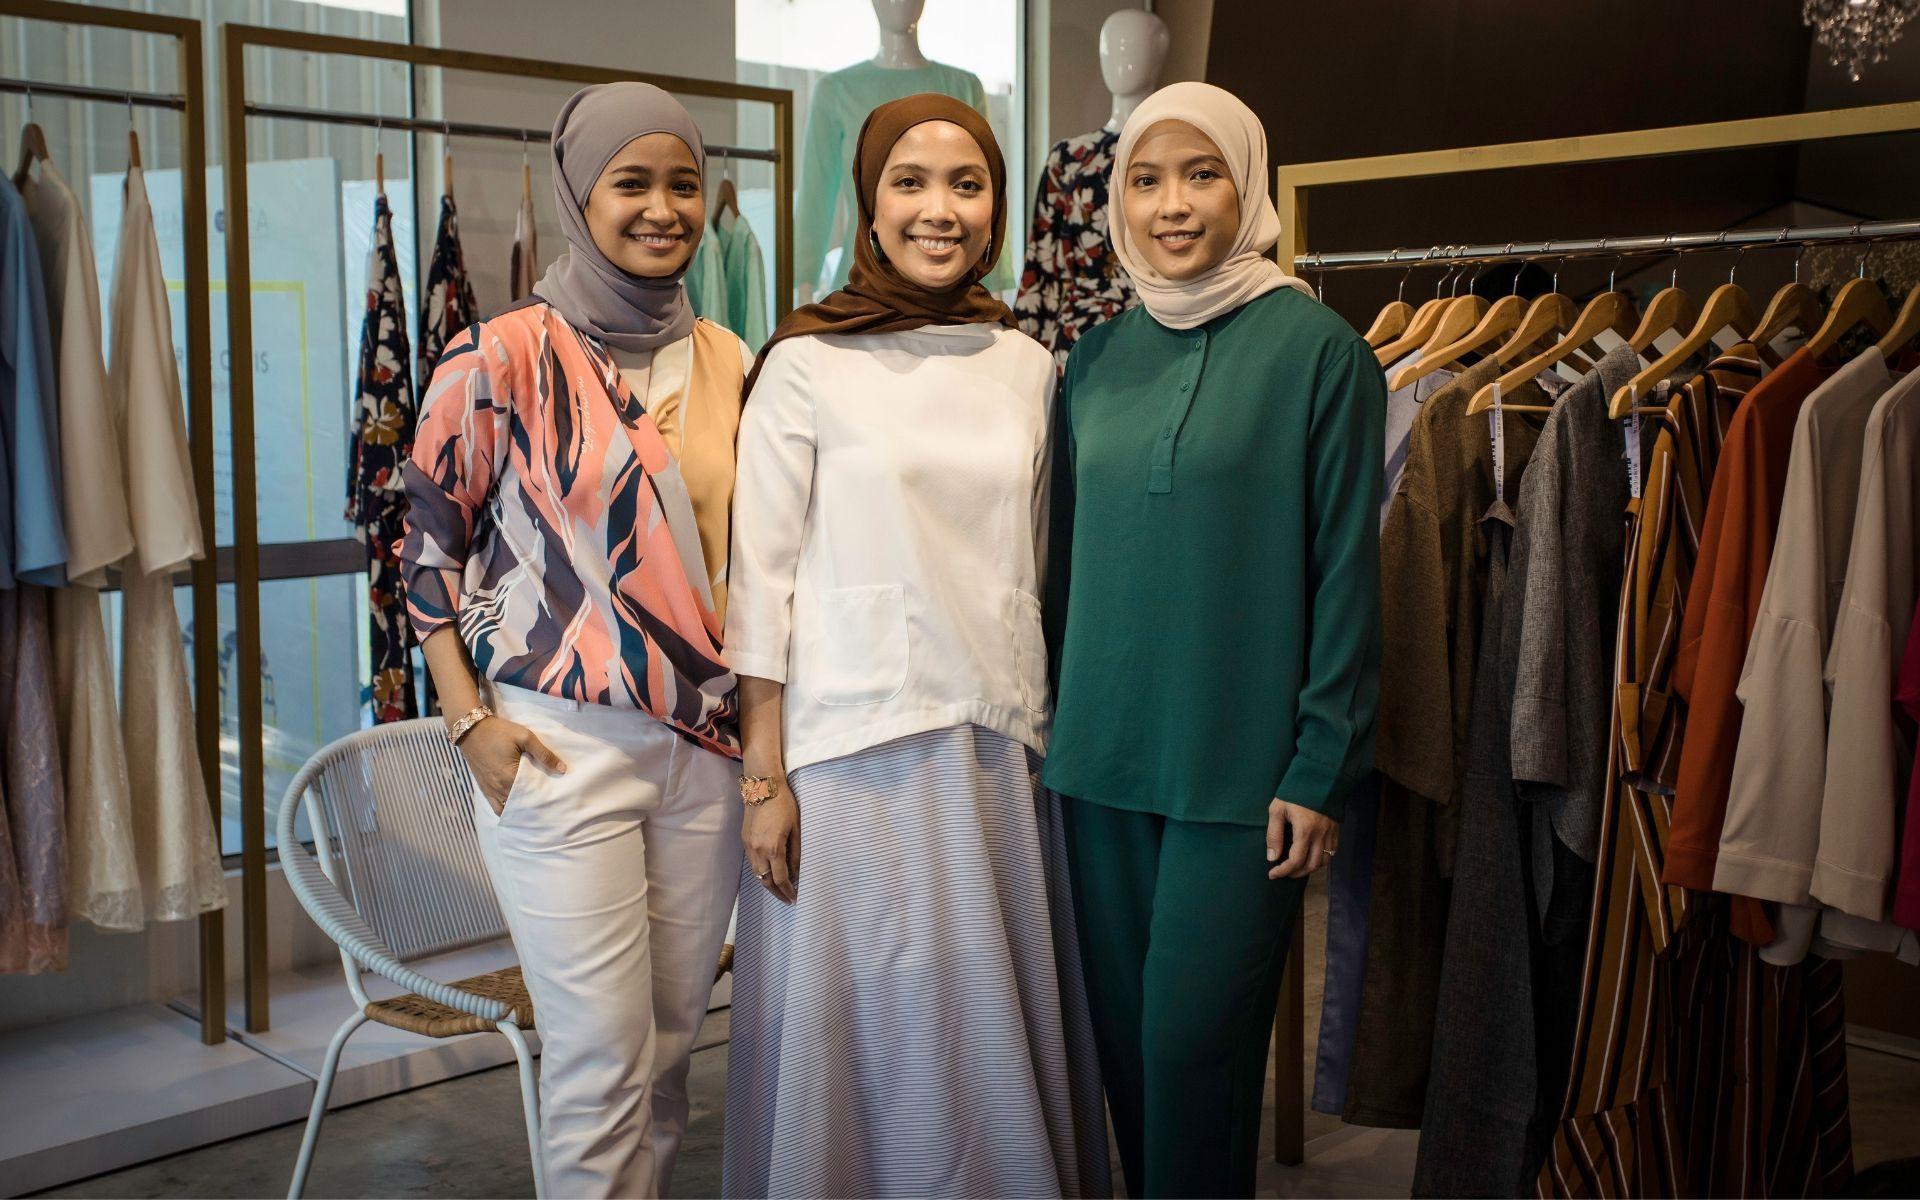 Photo credit: Dean Shaari / Malaysia Tatler